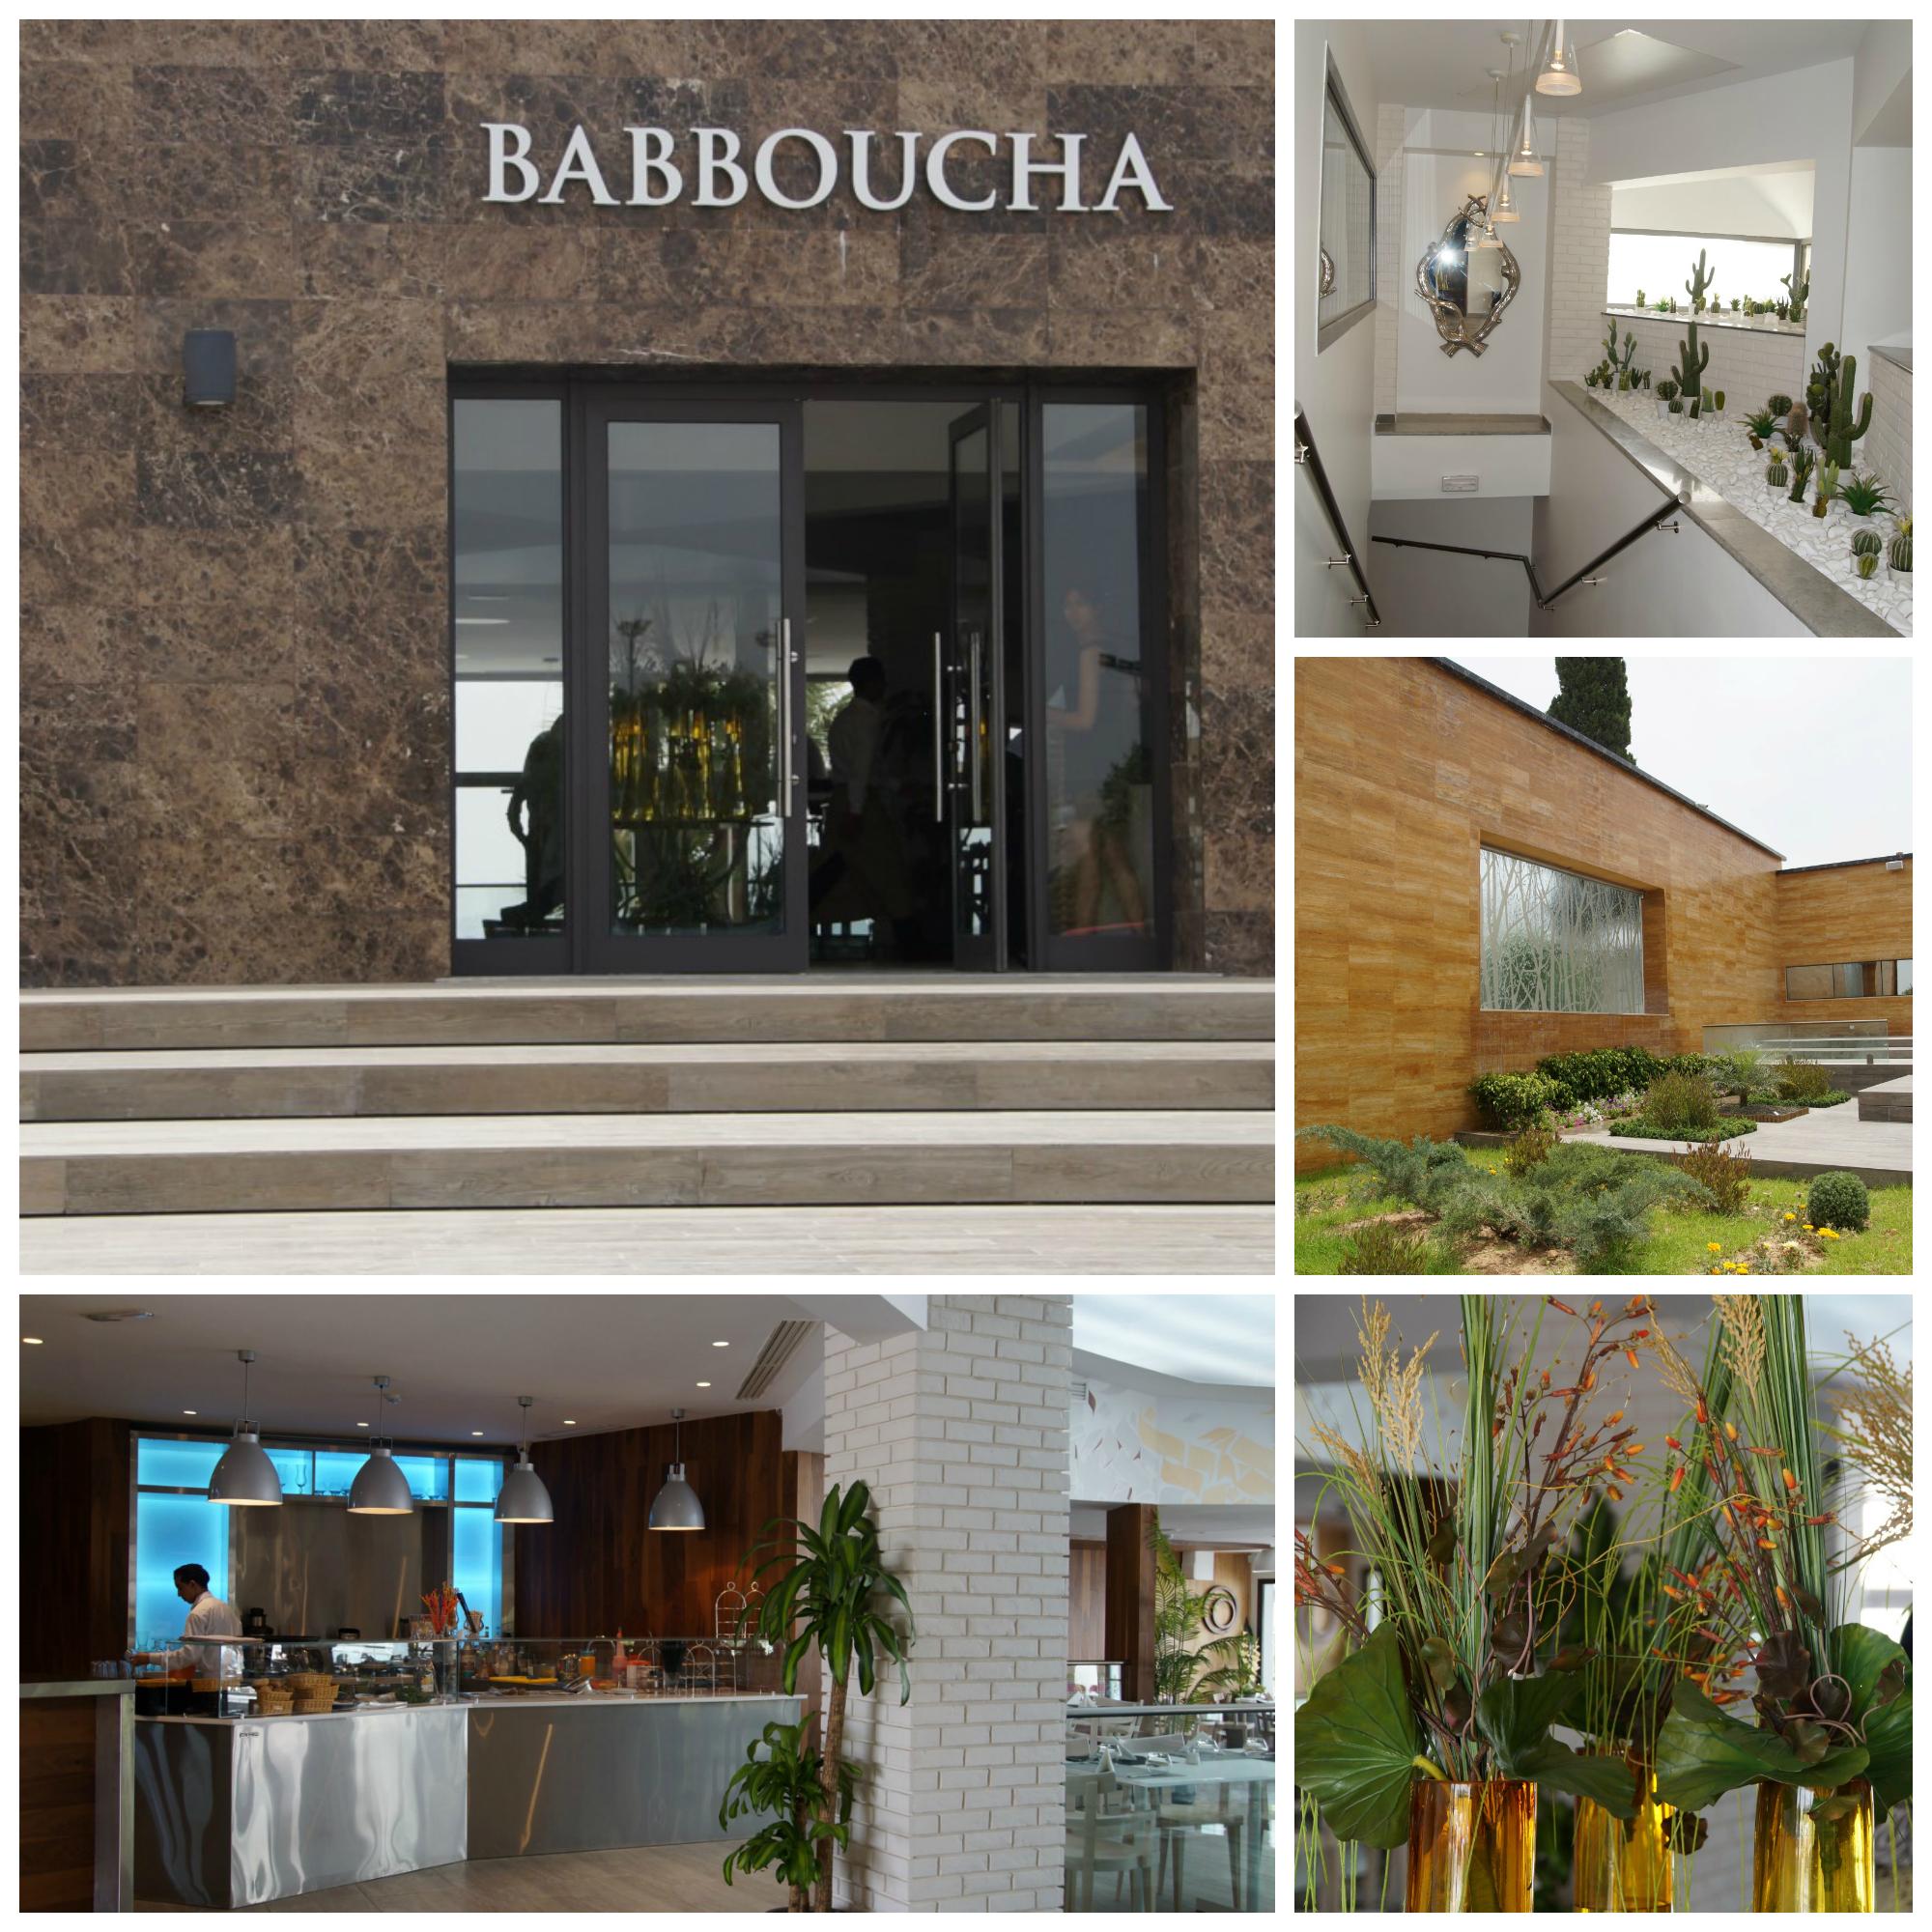 babboucha1